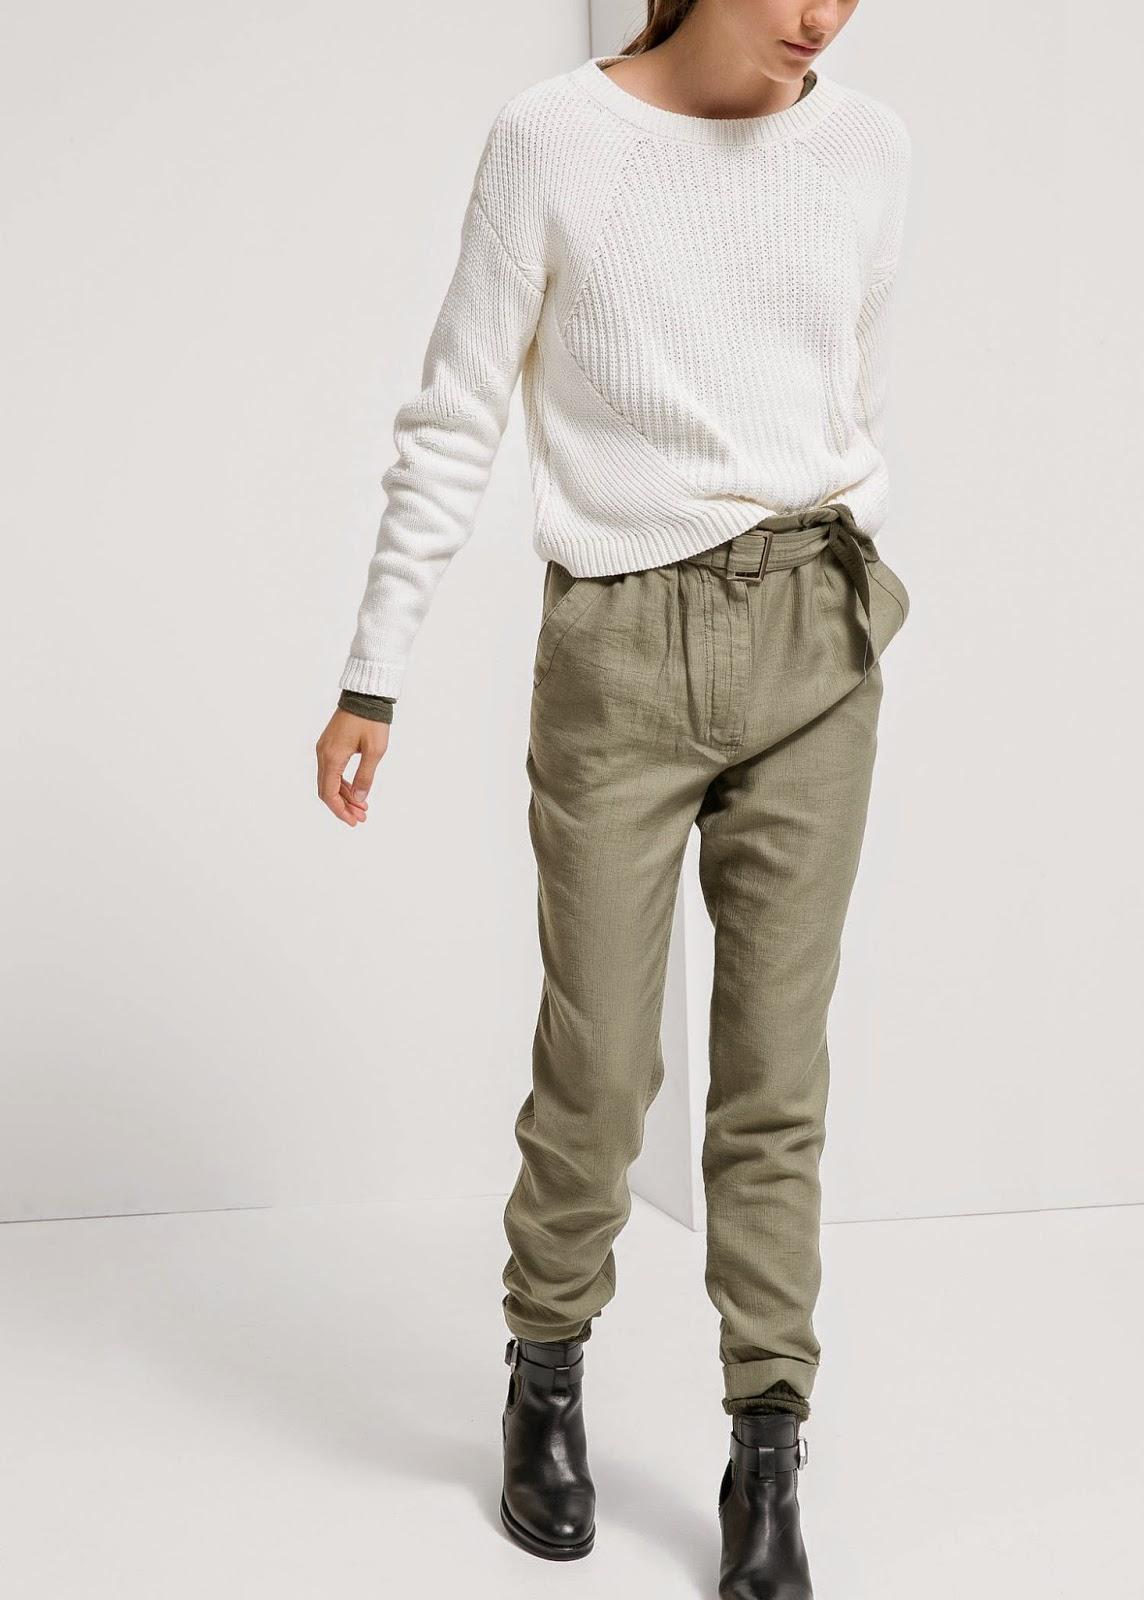 mango khaki trousers